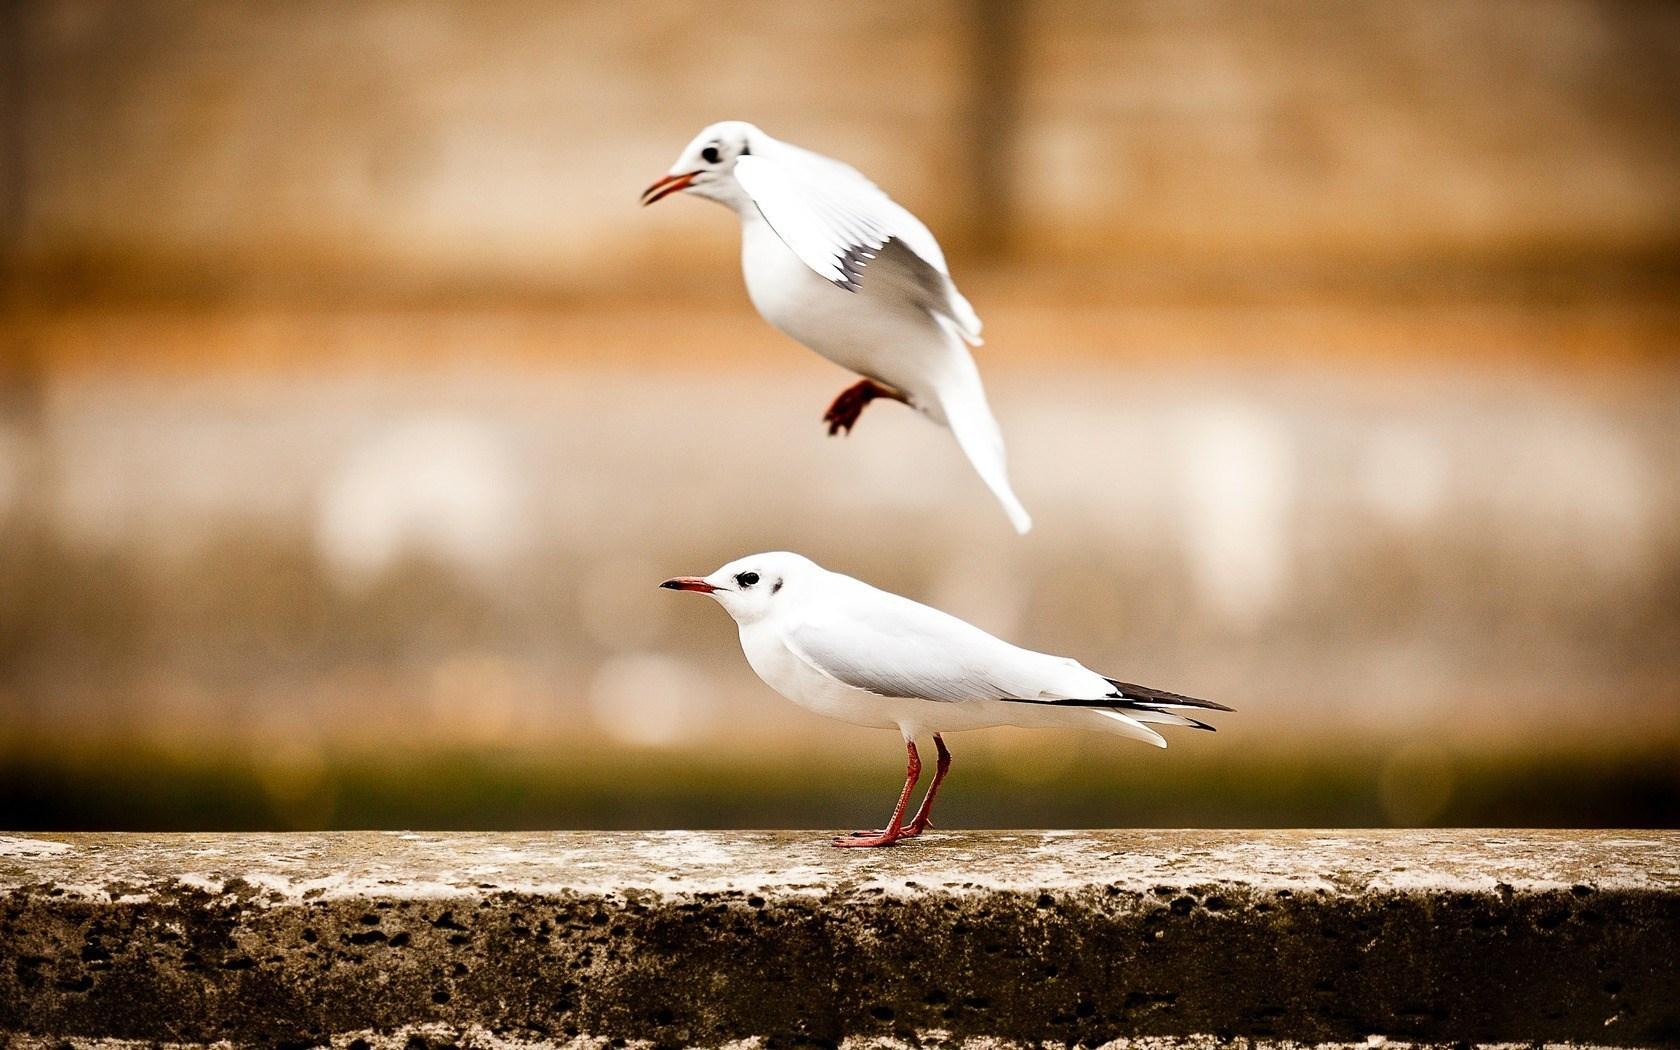 seagulls love